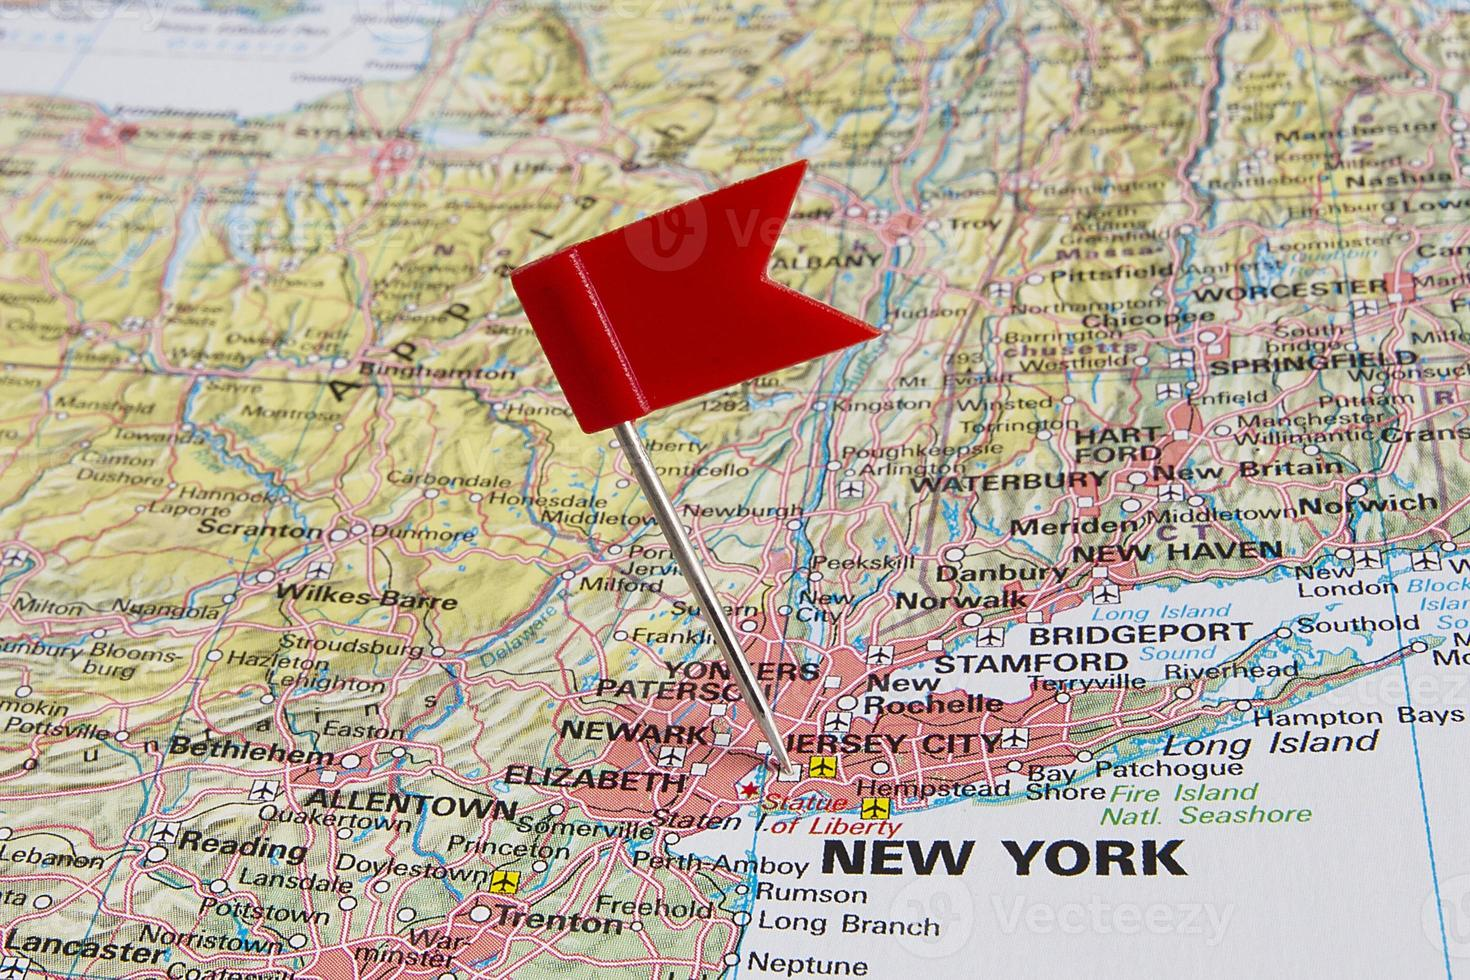 bestemming: new york foto